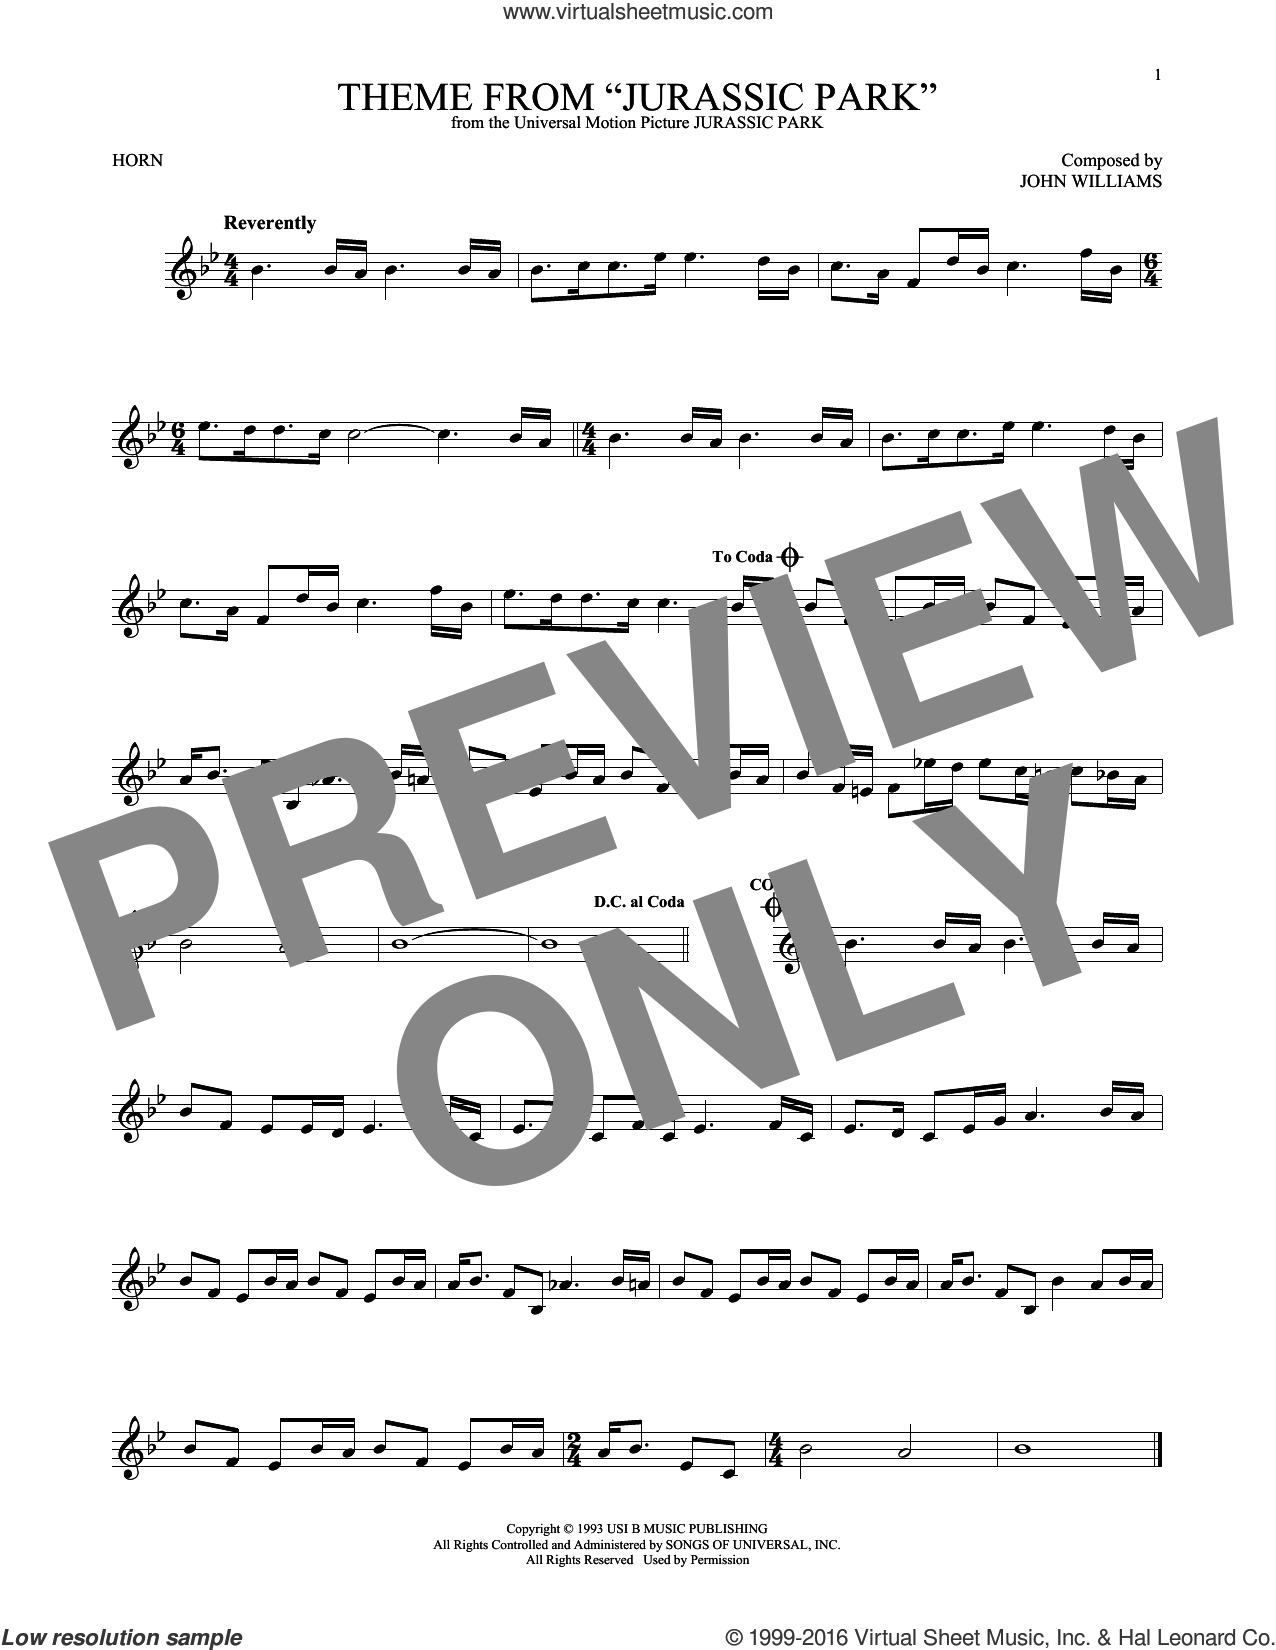 Theme From Jurassic Park sheet music for horn solo by John Williams, intermediate skill level